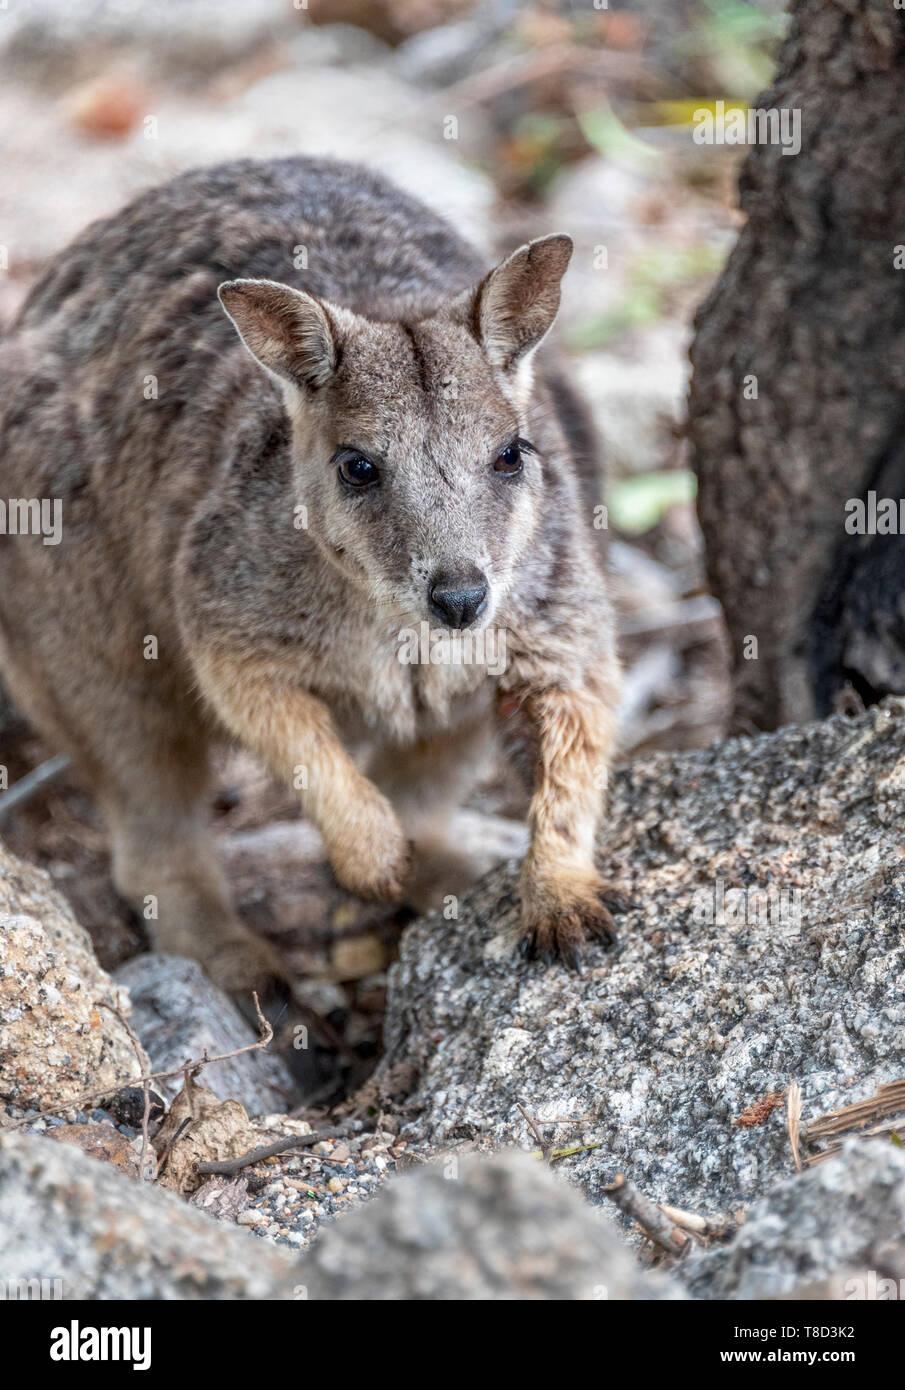 Unadorned rock wallaby at Granite gorge Stock Photo